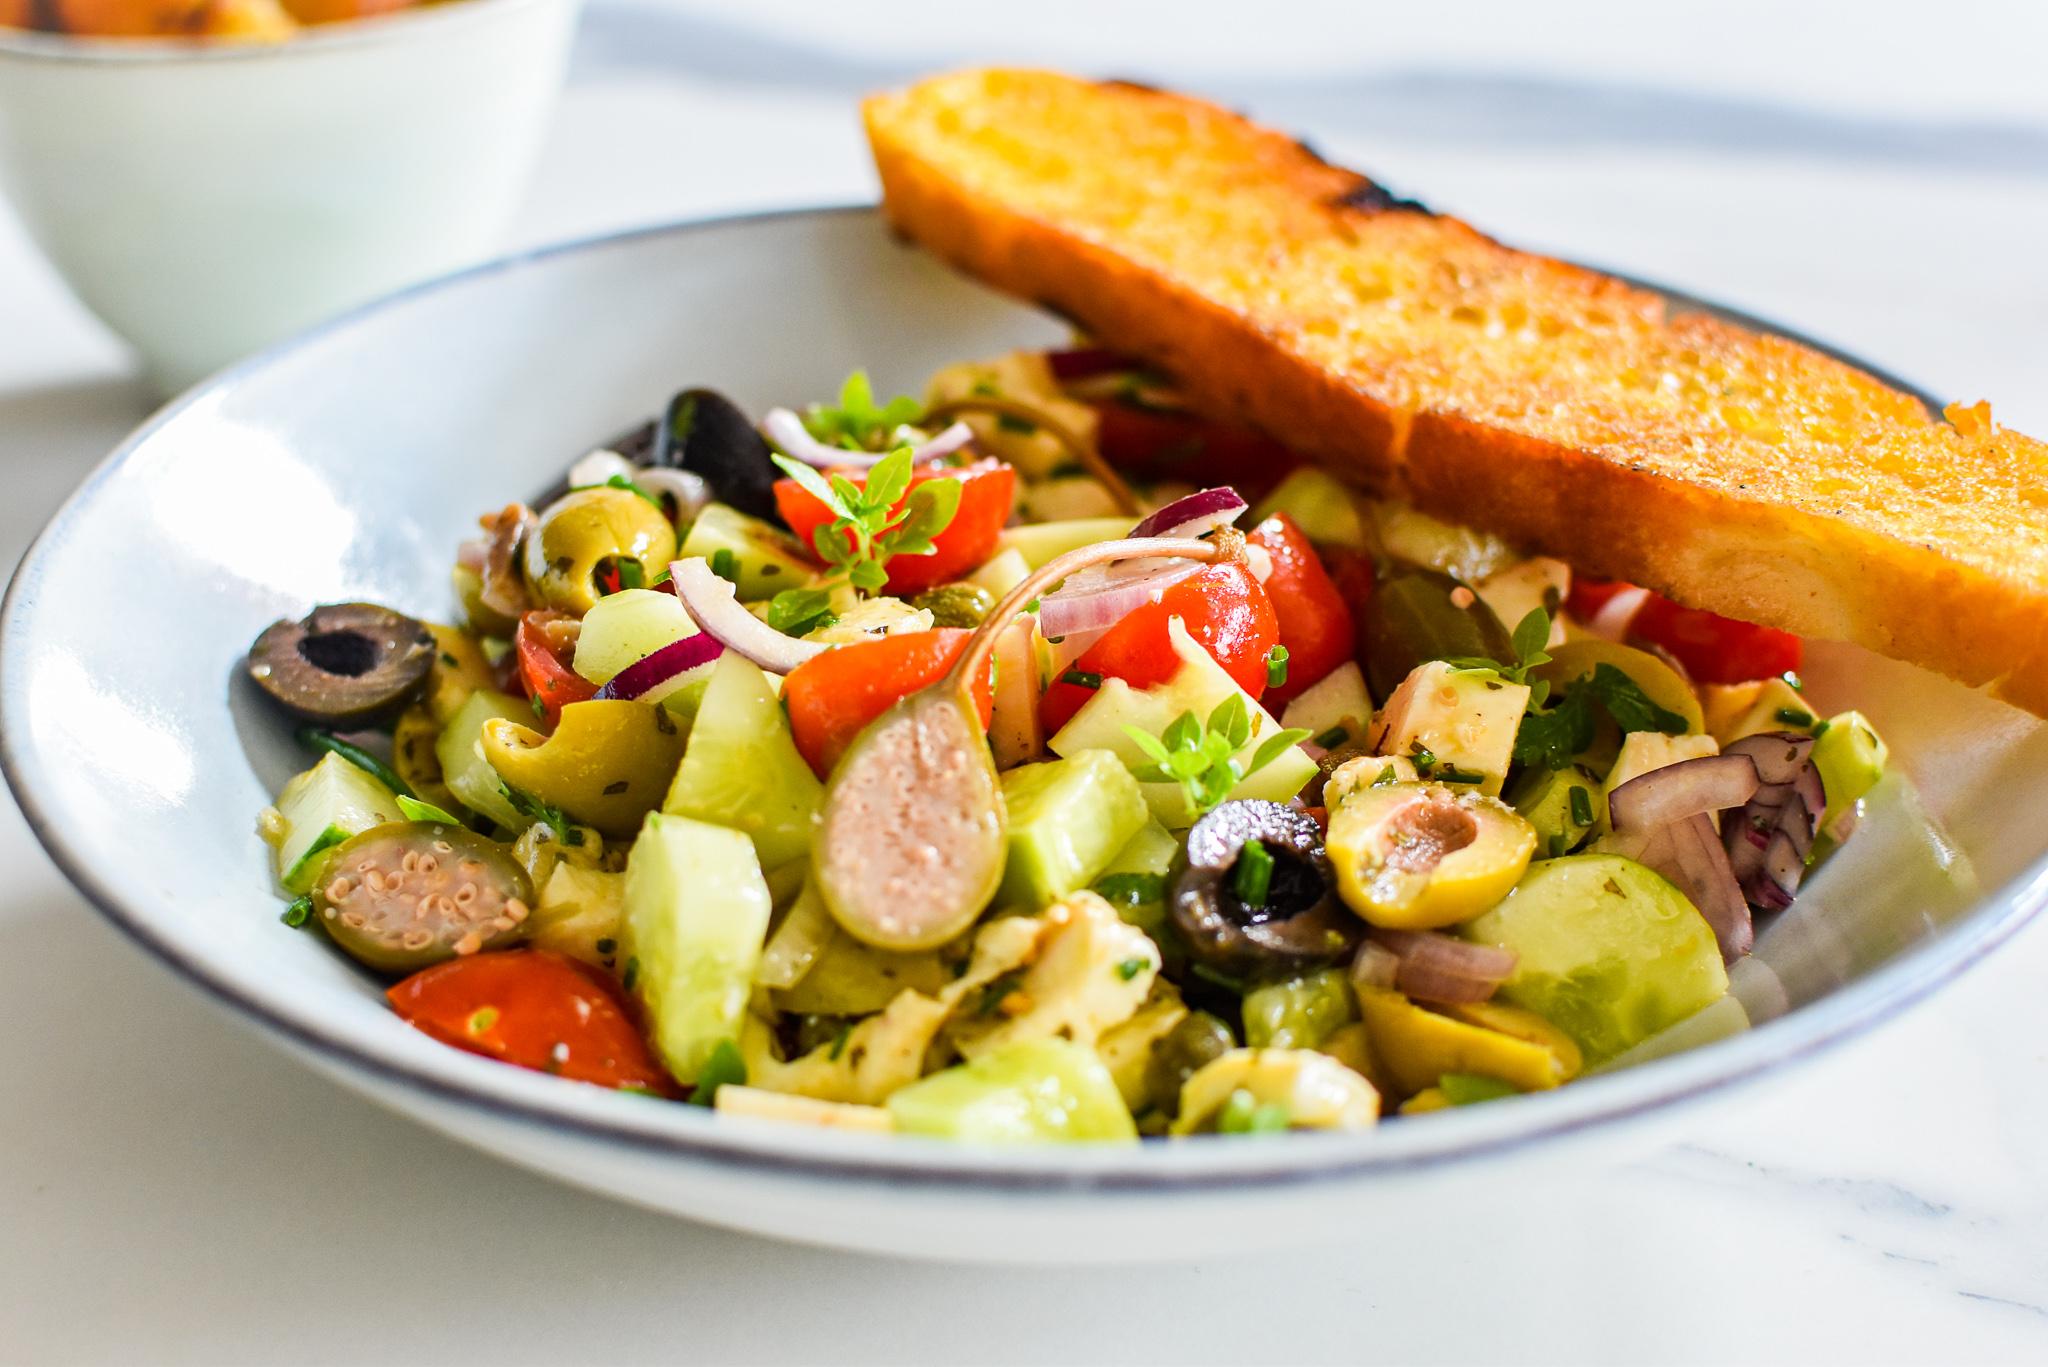 Panzanella - Italiaanse salade met geroosterd brood